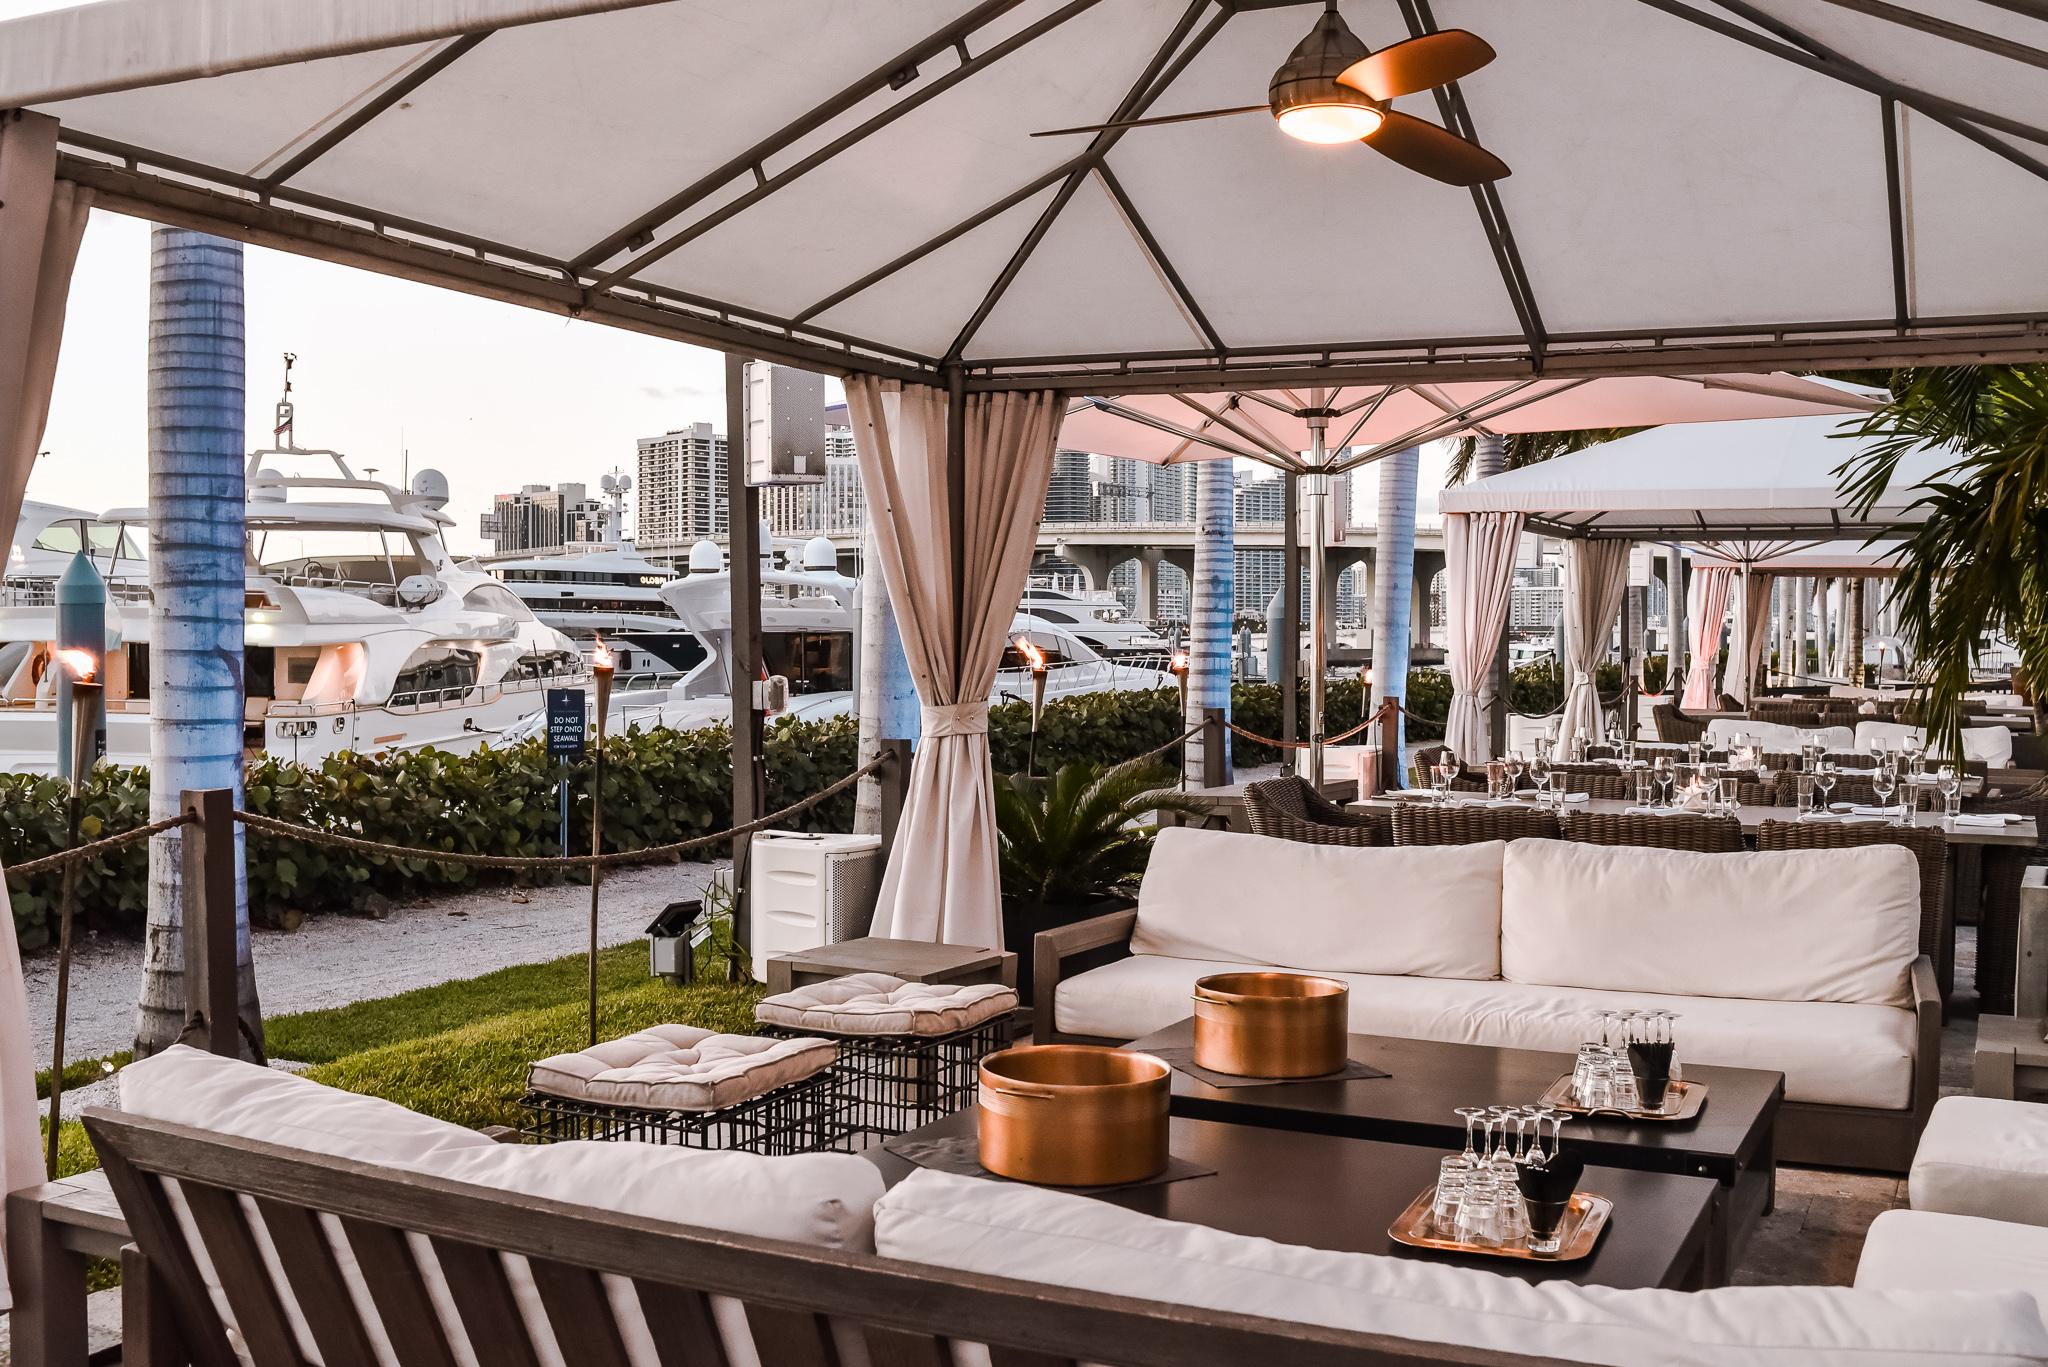 The Deck at Island Gardens Miami Cabanas - Get Ink PR